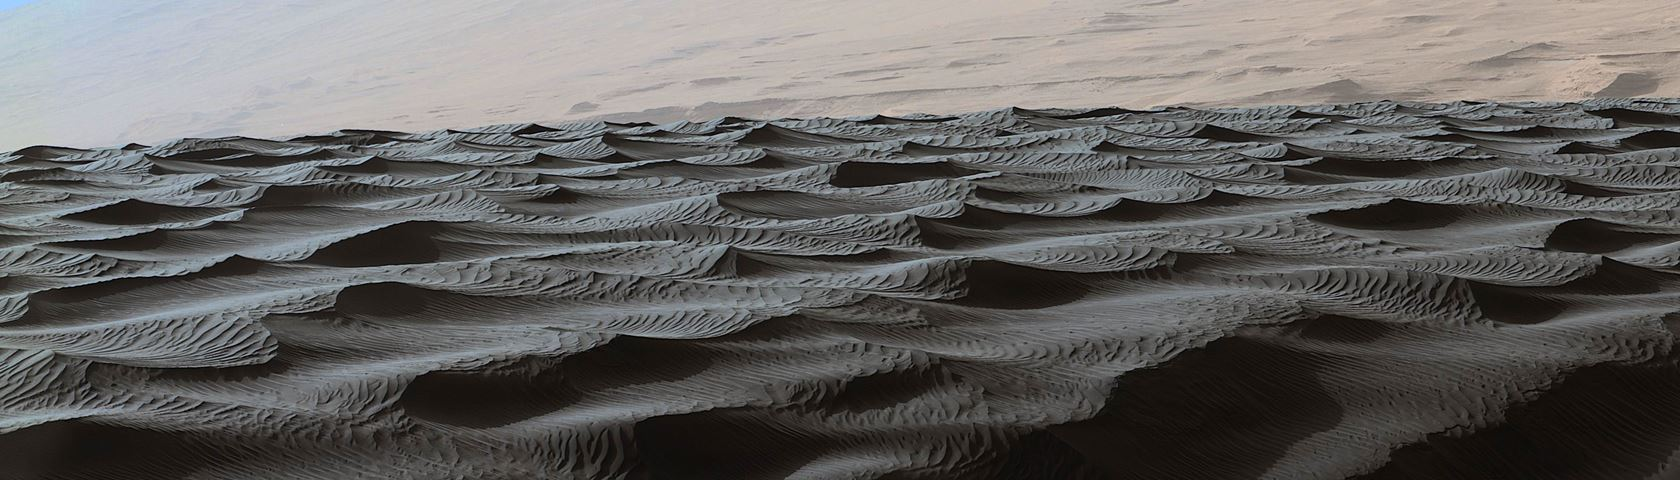 Dark Dunes on Mars